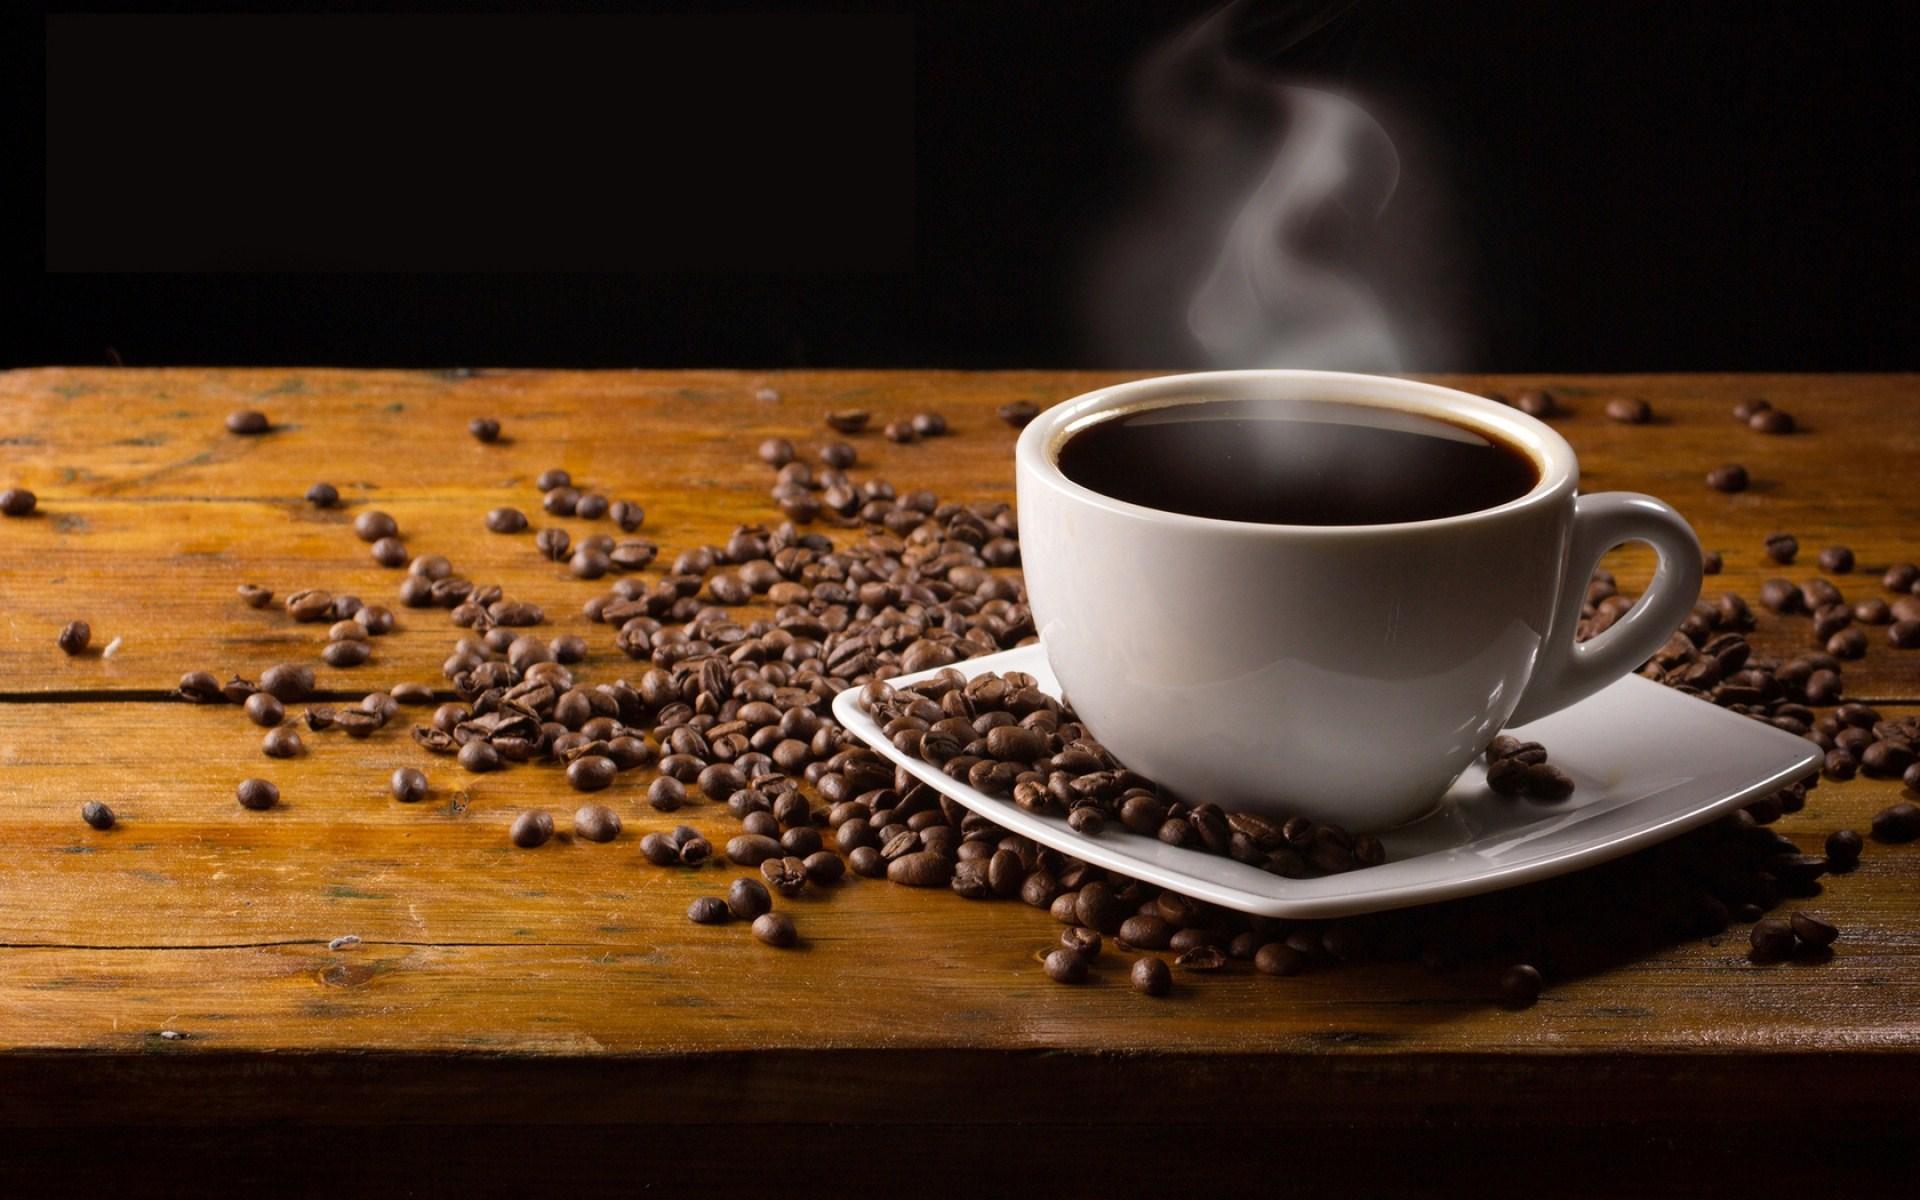 Saucer-Coffee-Cup